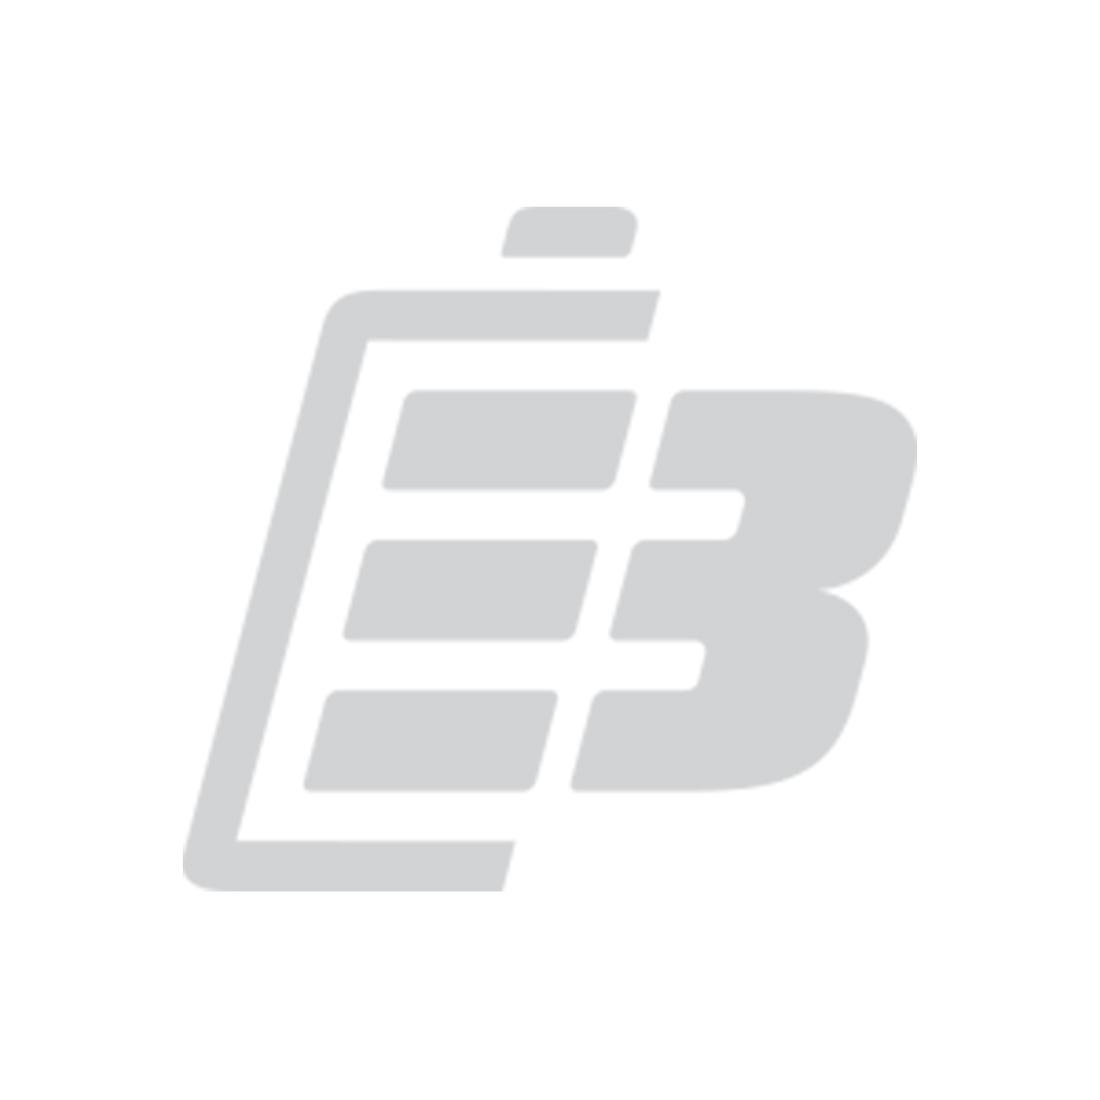 Choetech Q5009 3 x USB Wall Adapter